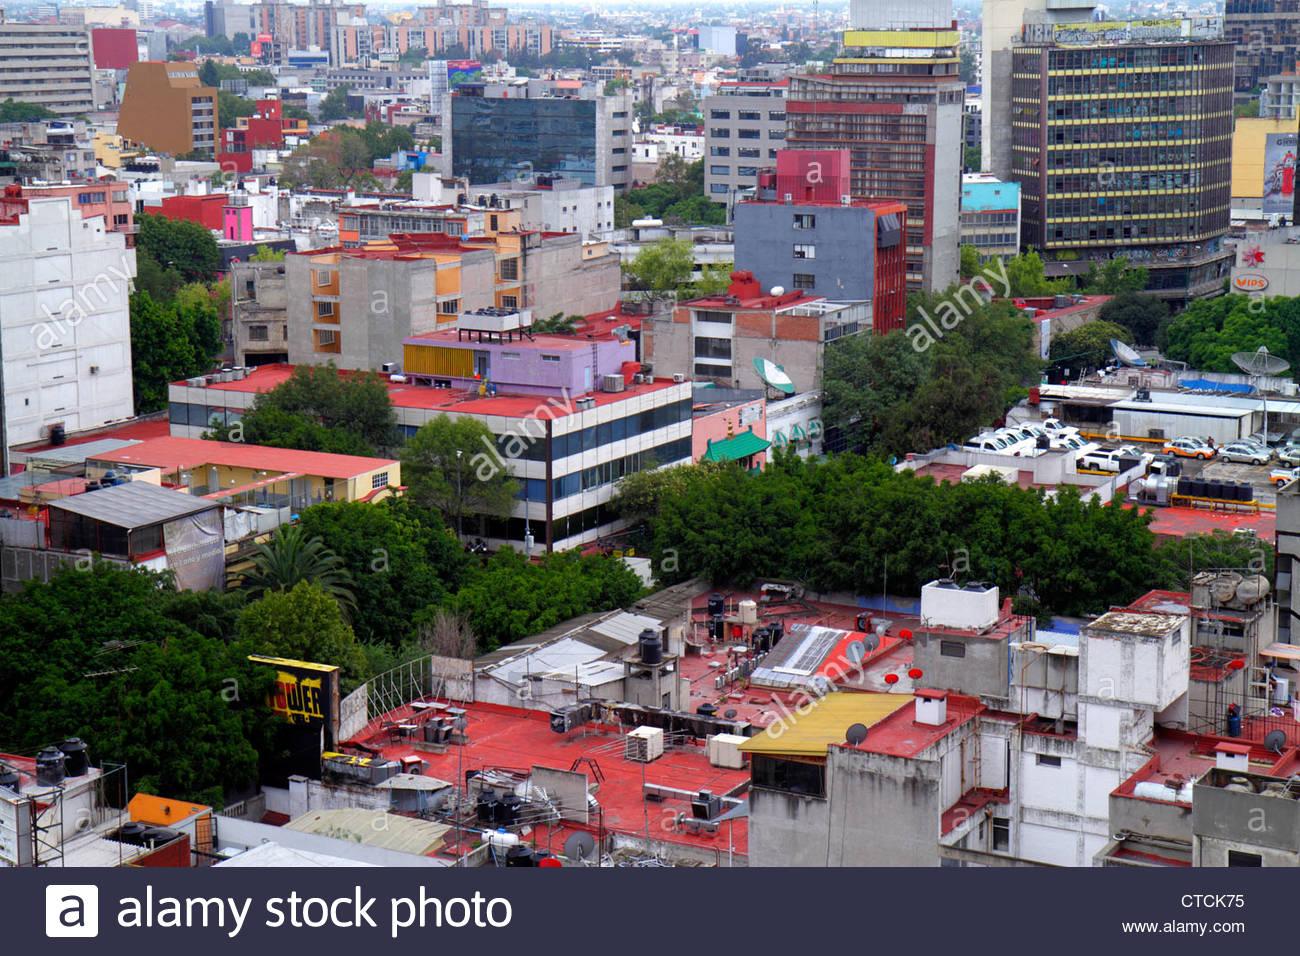 Mexico City Mexico DF D.F. Ciudad de México Federal District Distrito Federal Zona Rosa Doctores - Stock Image